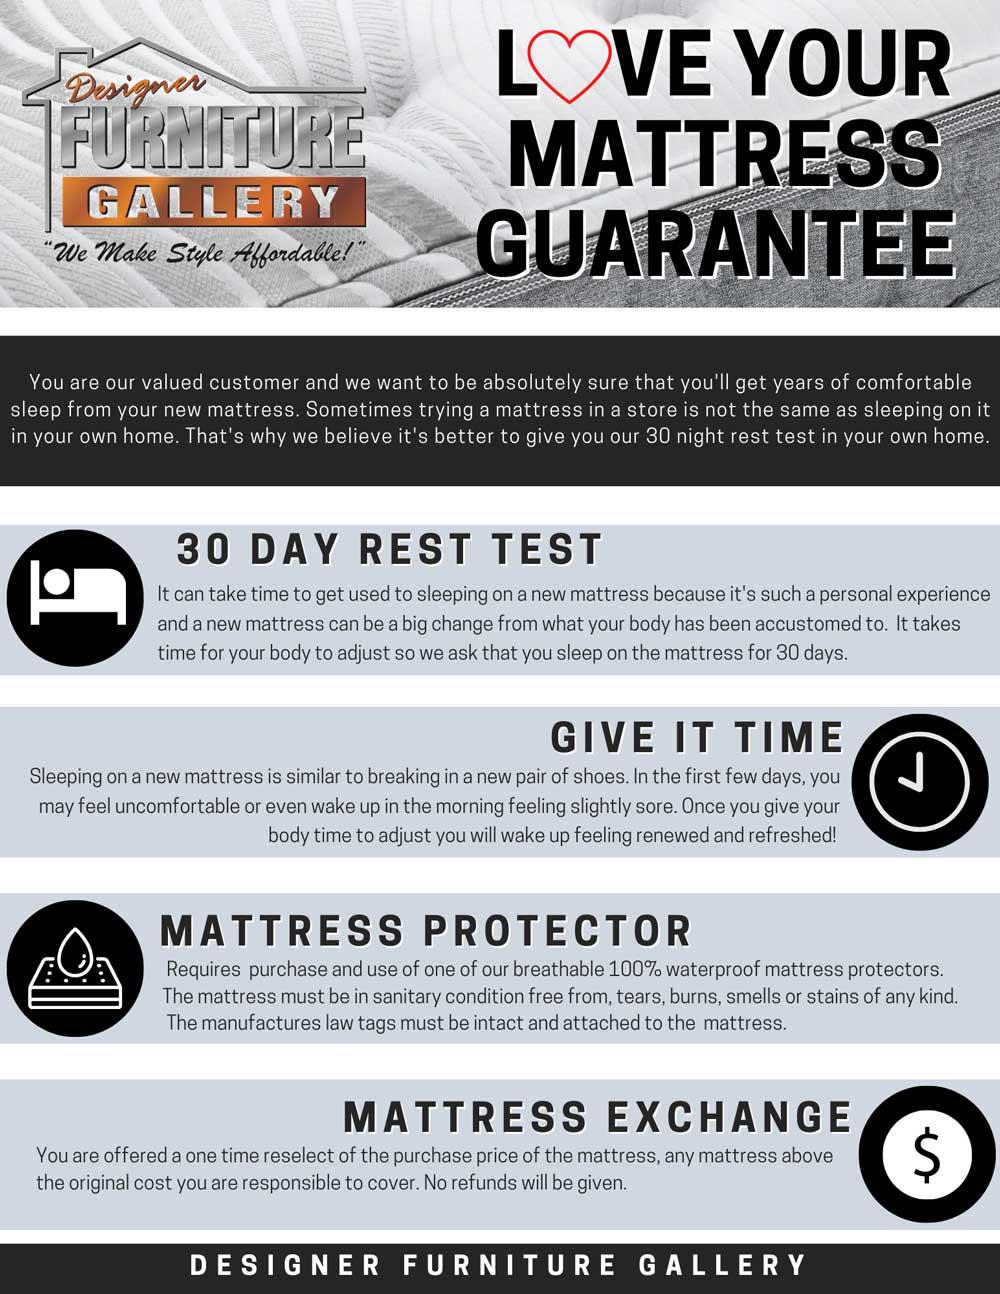 Love Your Mattress Guarantee